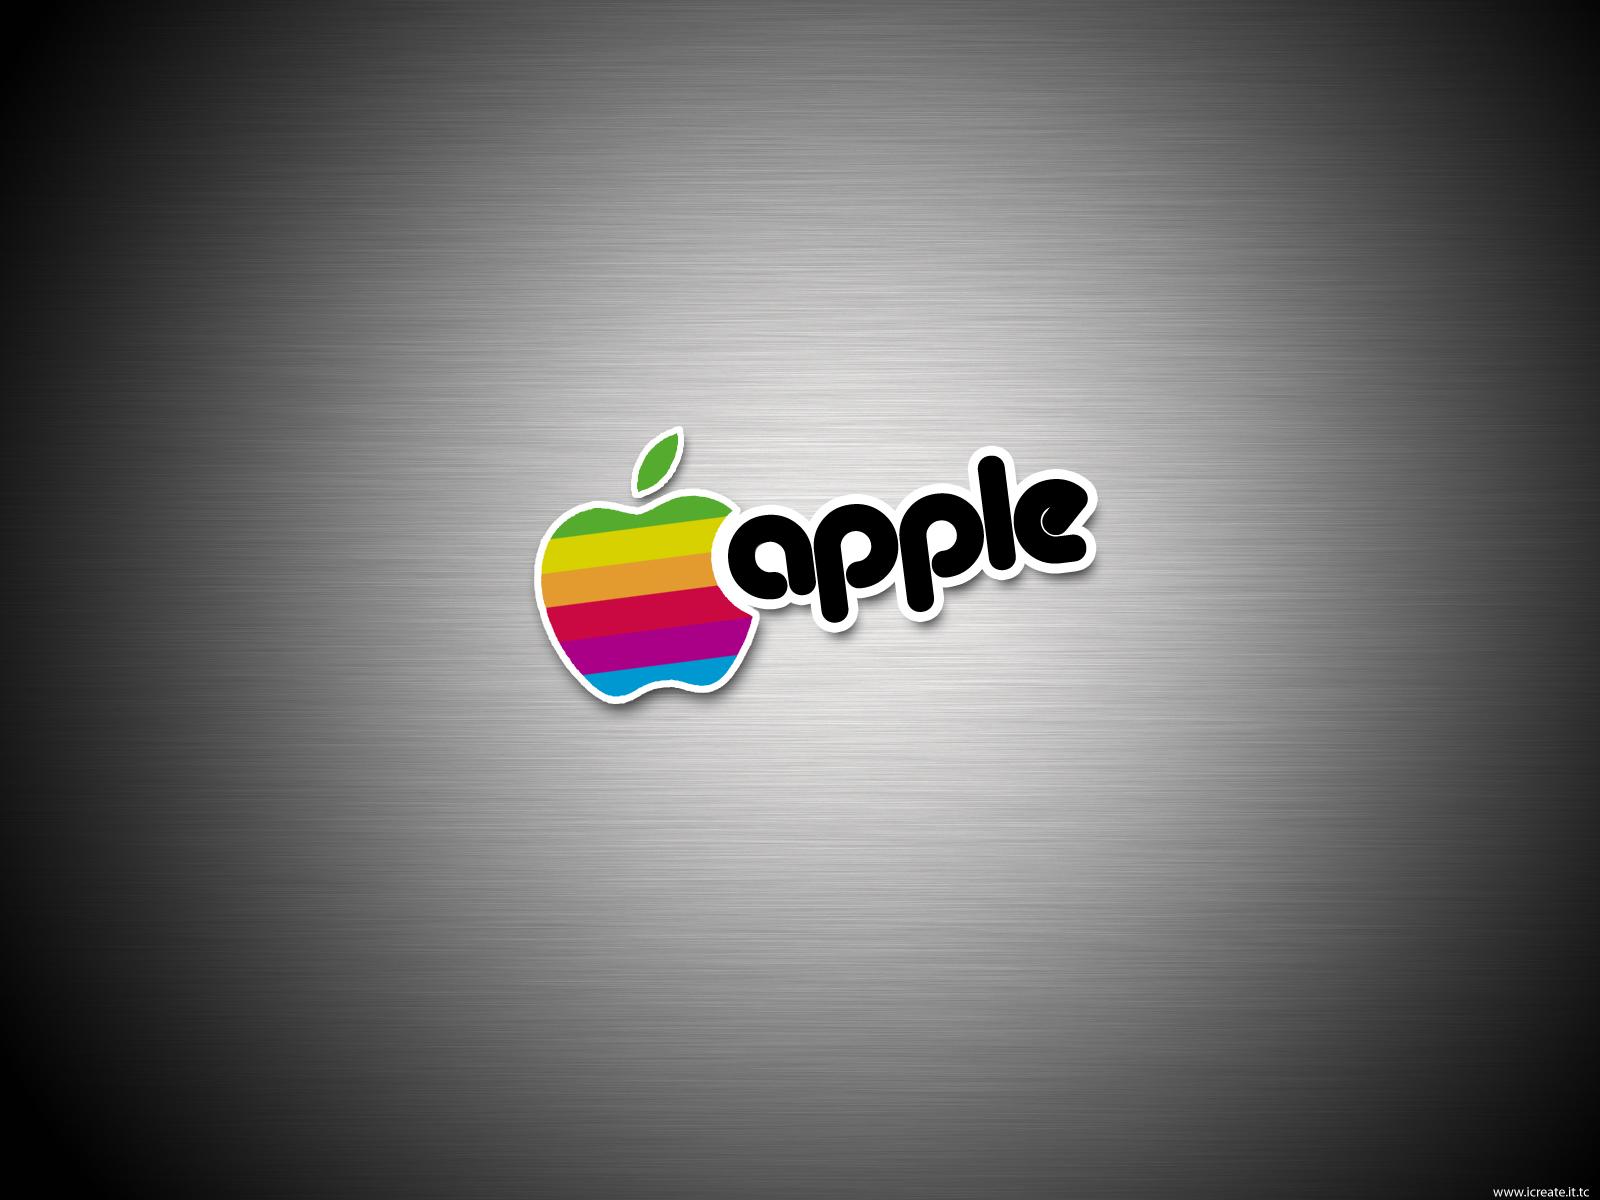 Apple Macintosh Wallpapers HD Nice Wallpapers 1600x1200